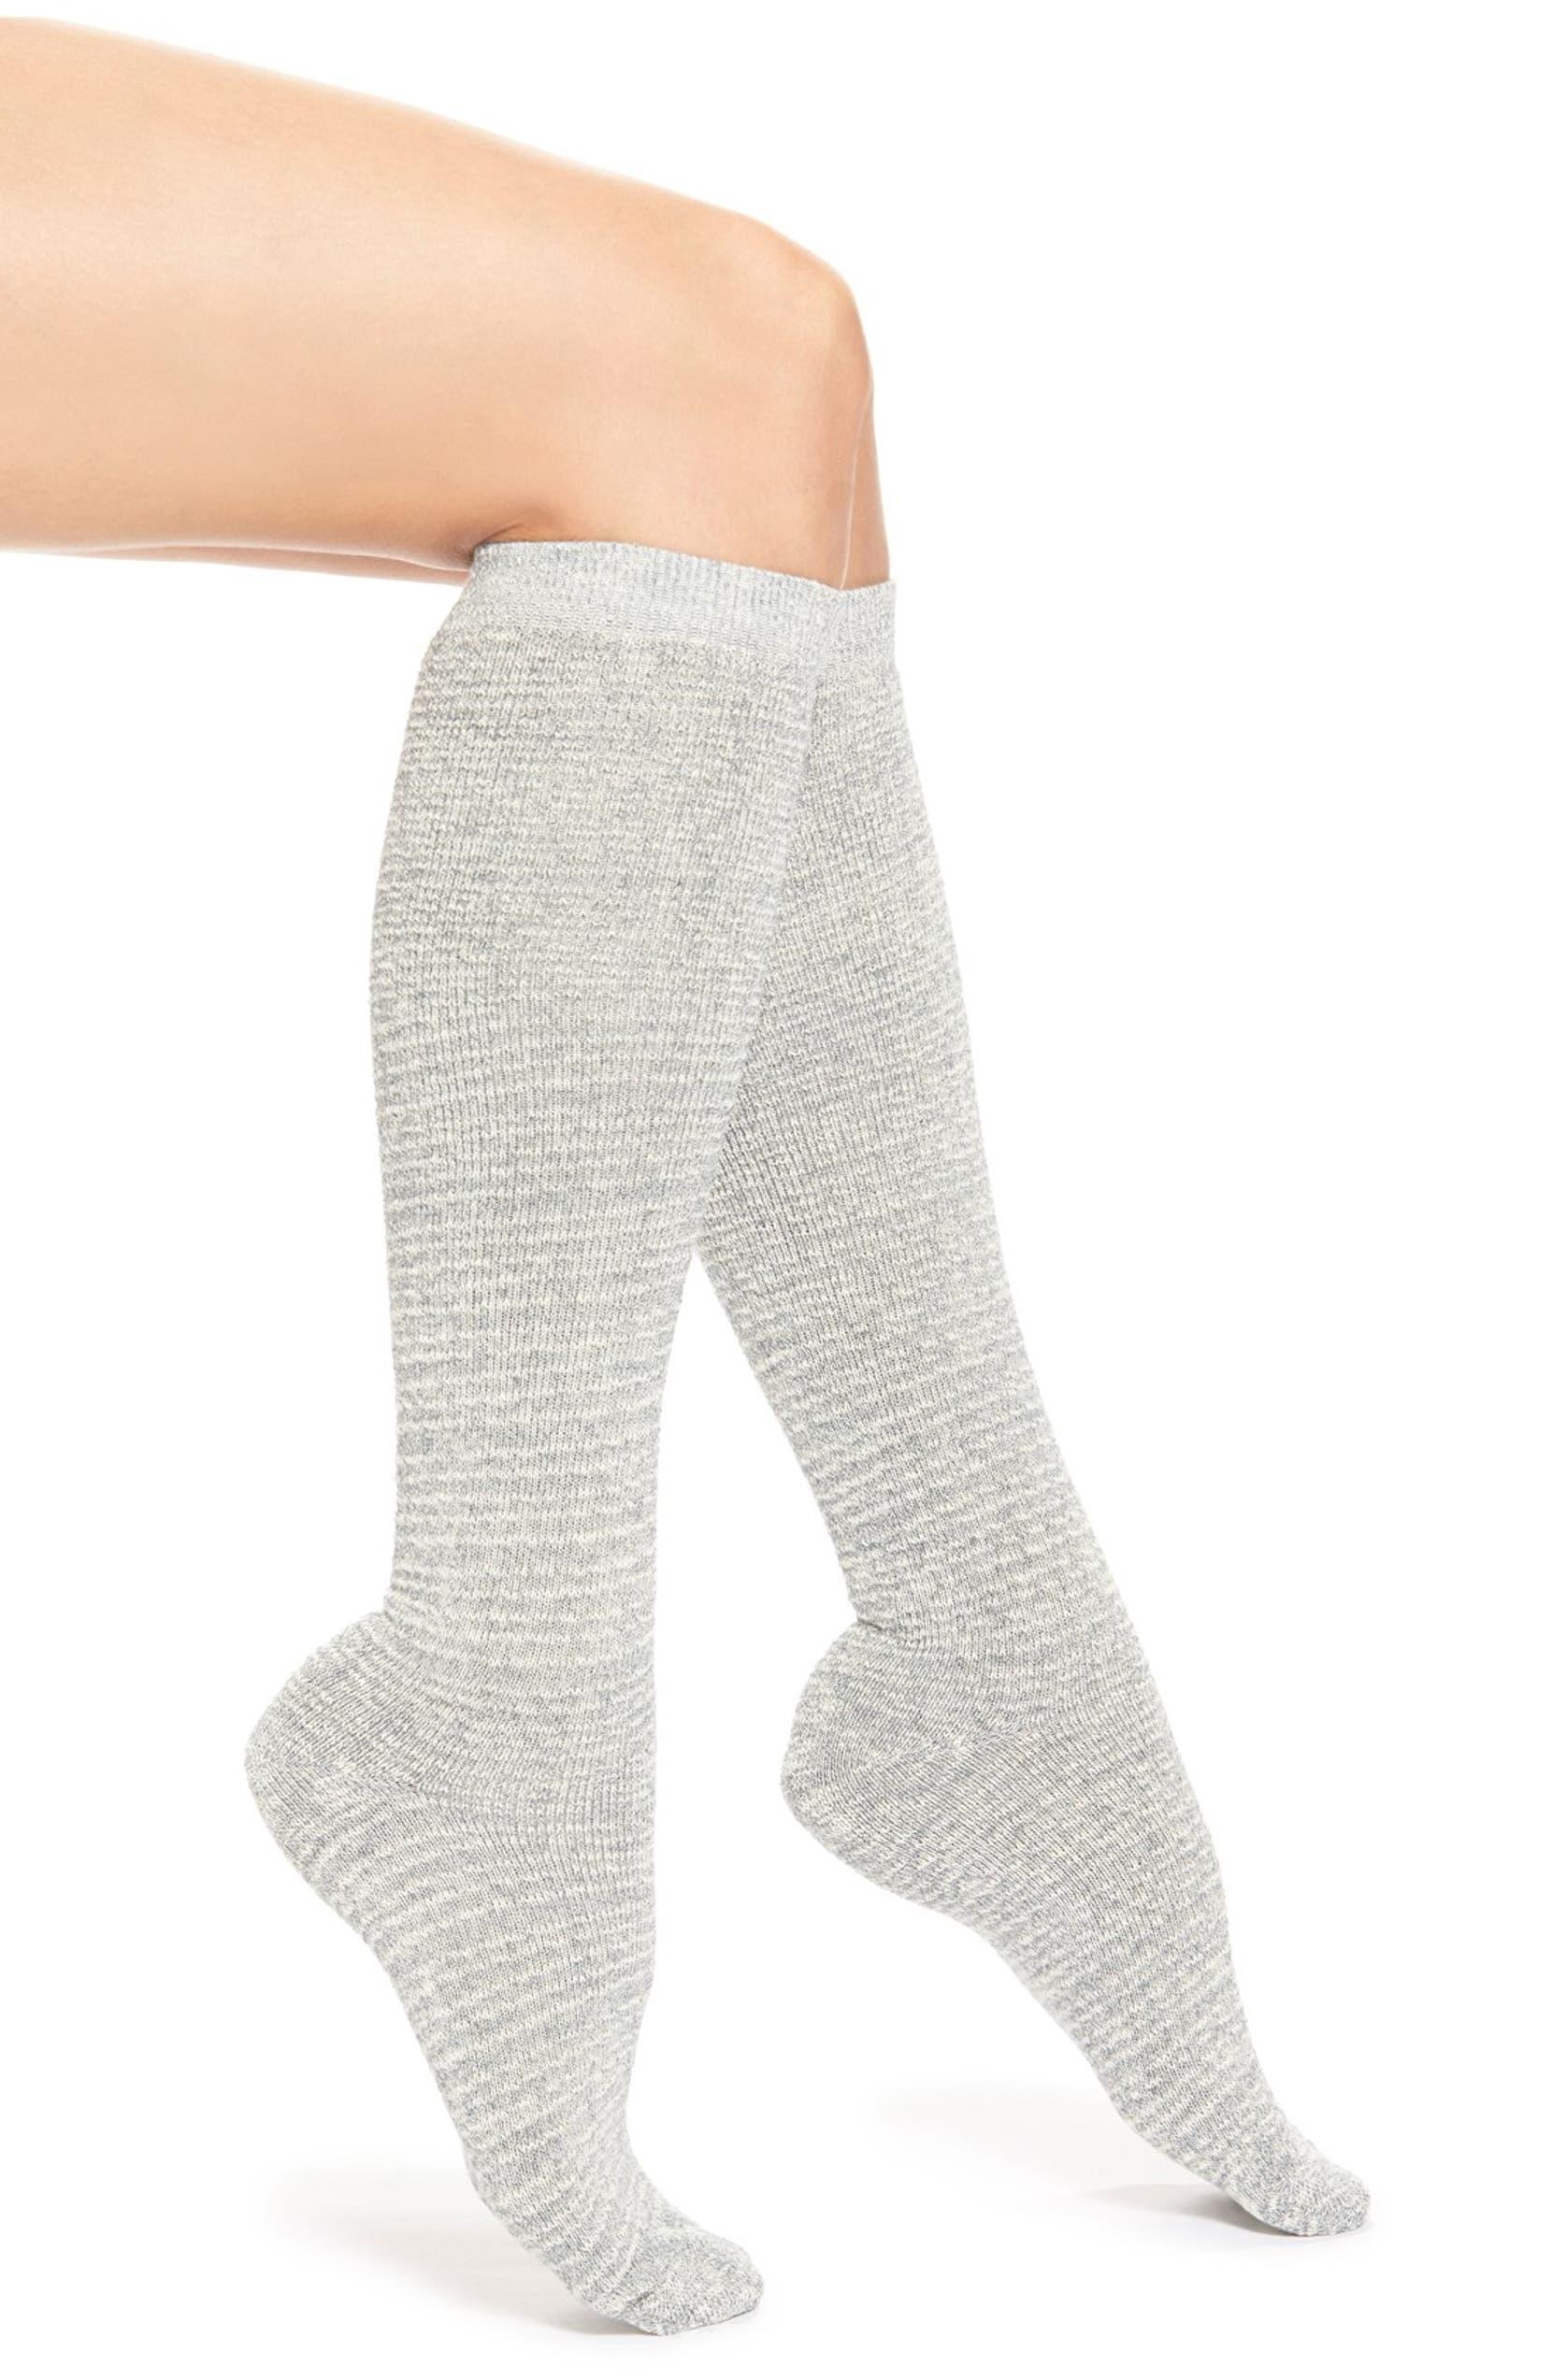 da882ea0924 Lemon  Eyelash  Cotton Blend Knee High Socks